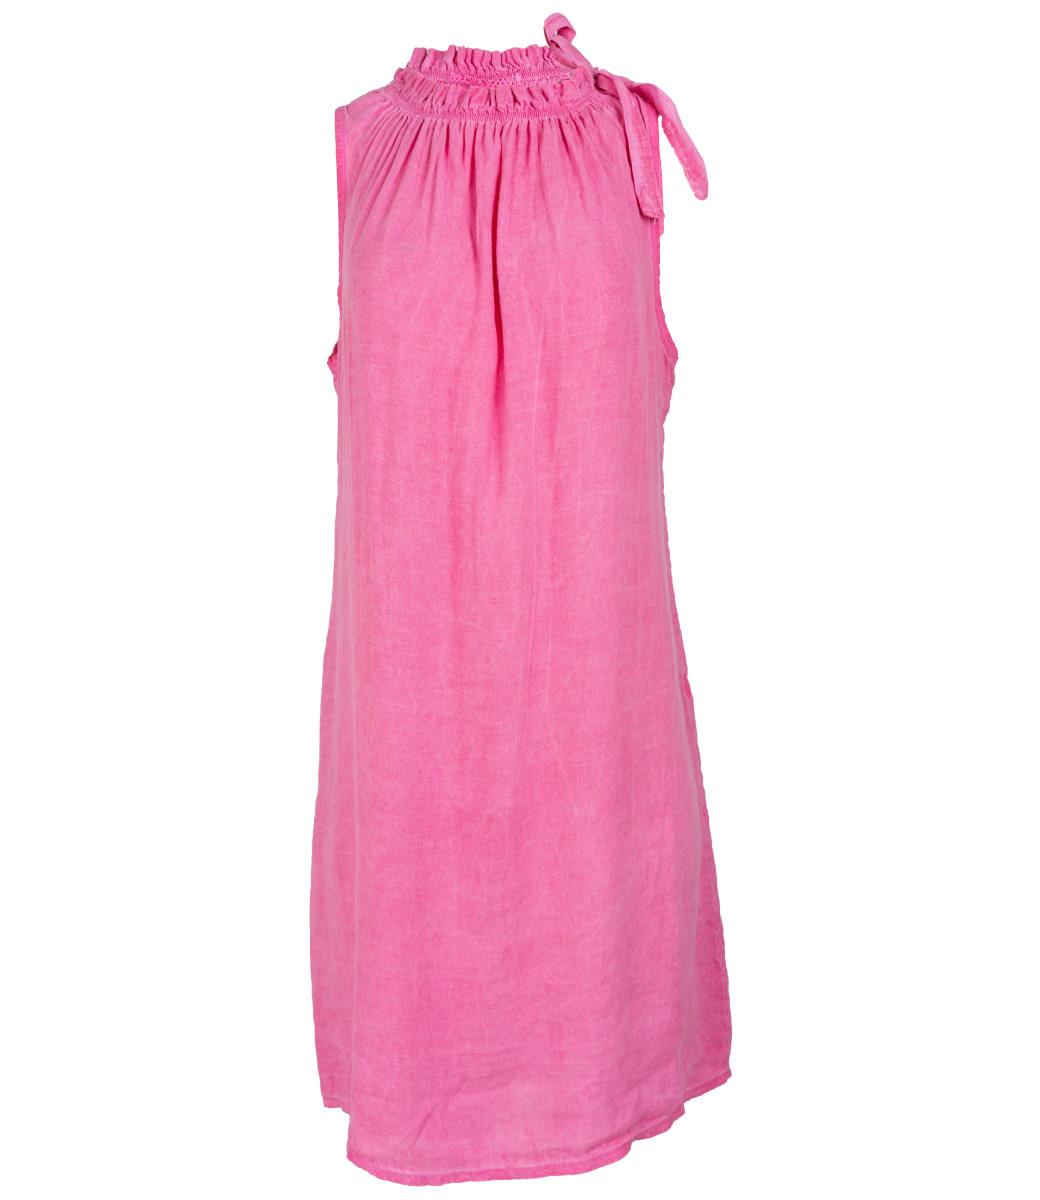 Wannahavesfashion Jurk roze halter linnen